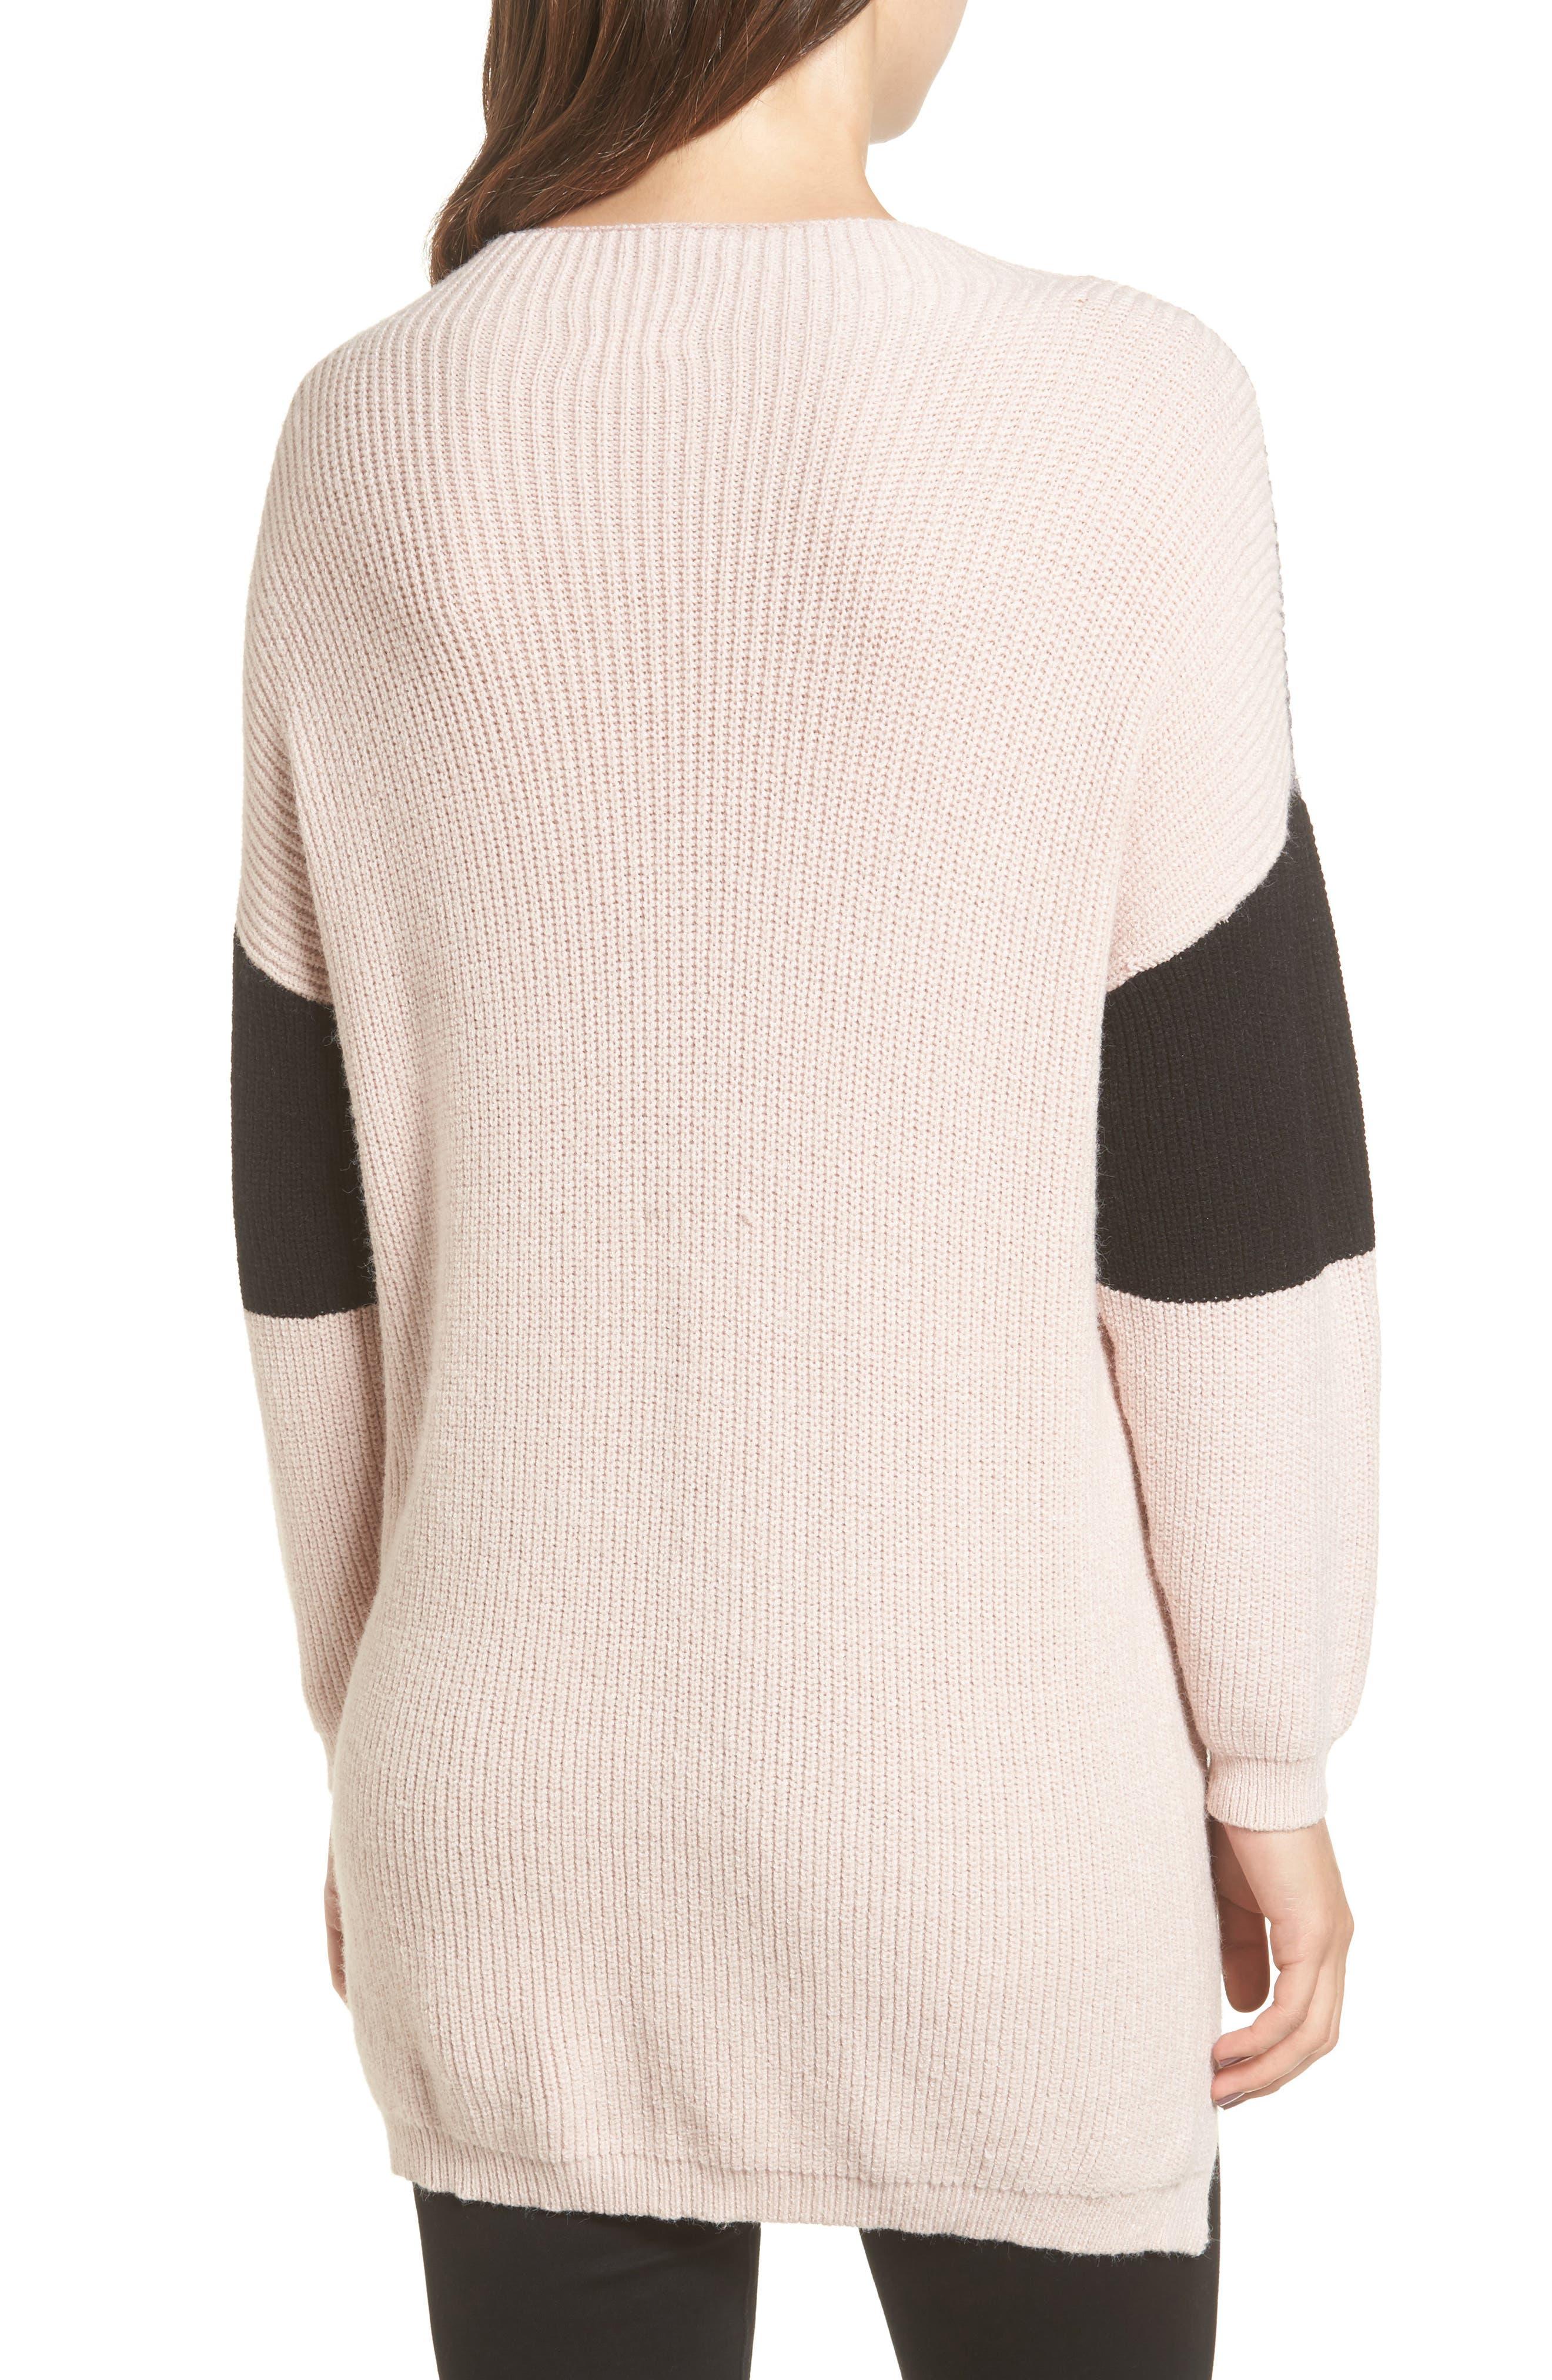 Colorblock Tunic Sweater,                             Alternate thumbnail 2, color,                             020